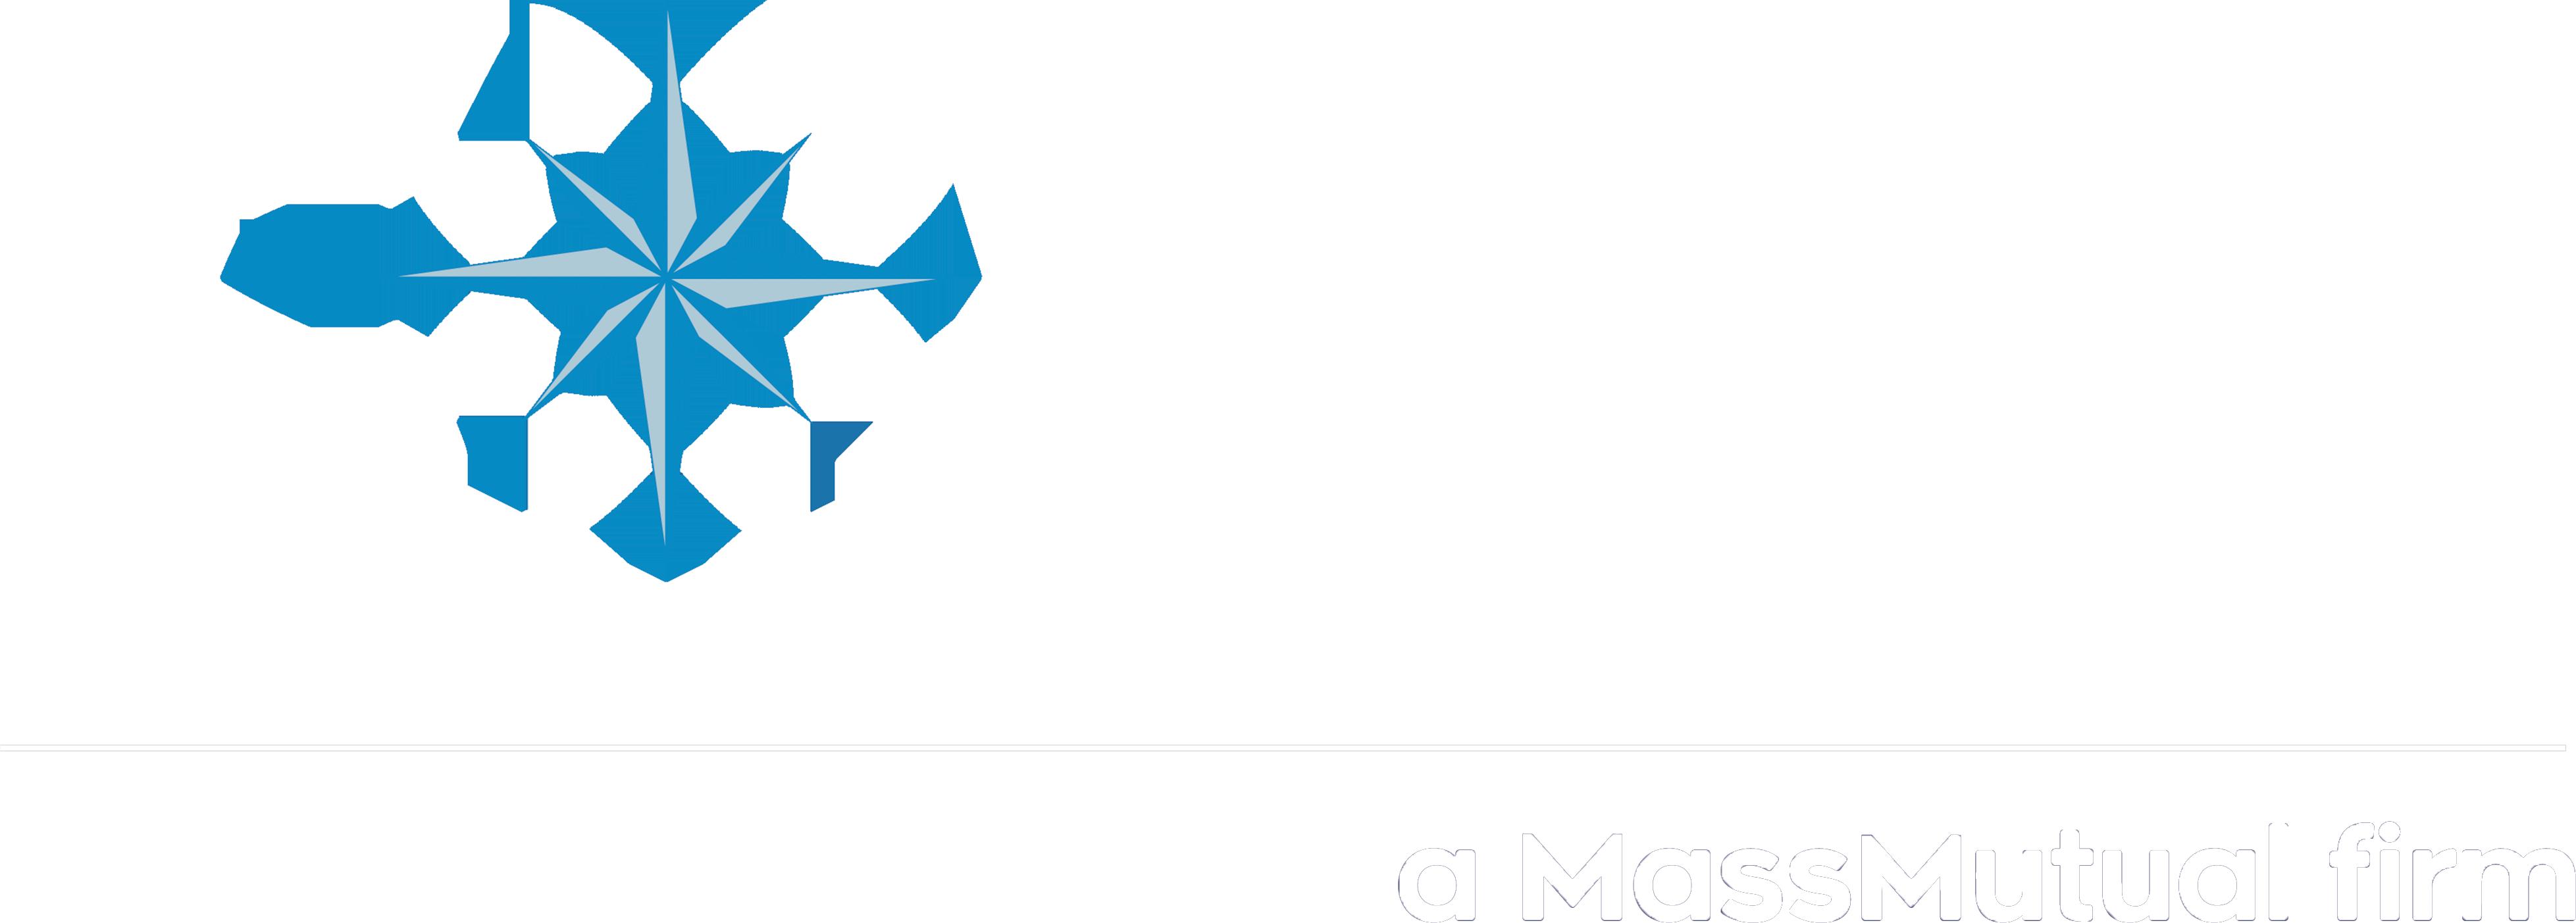 Coastal Wealth a MassMutual firm